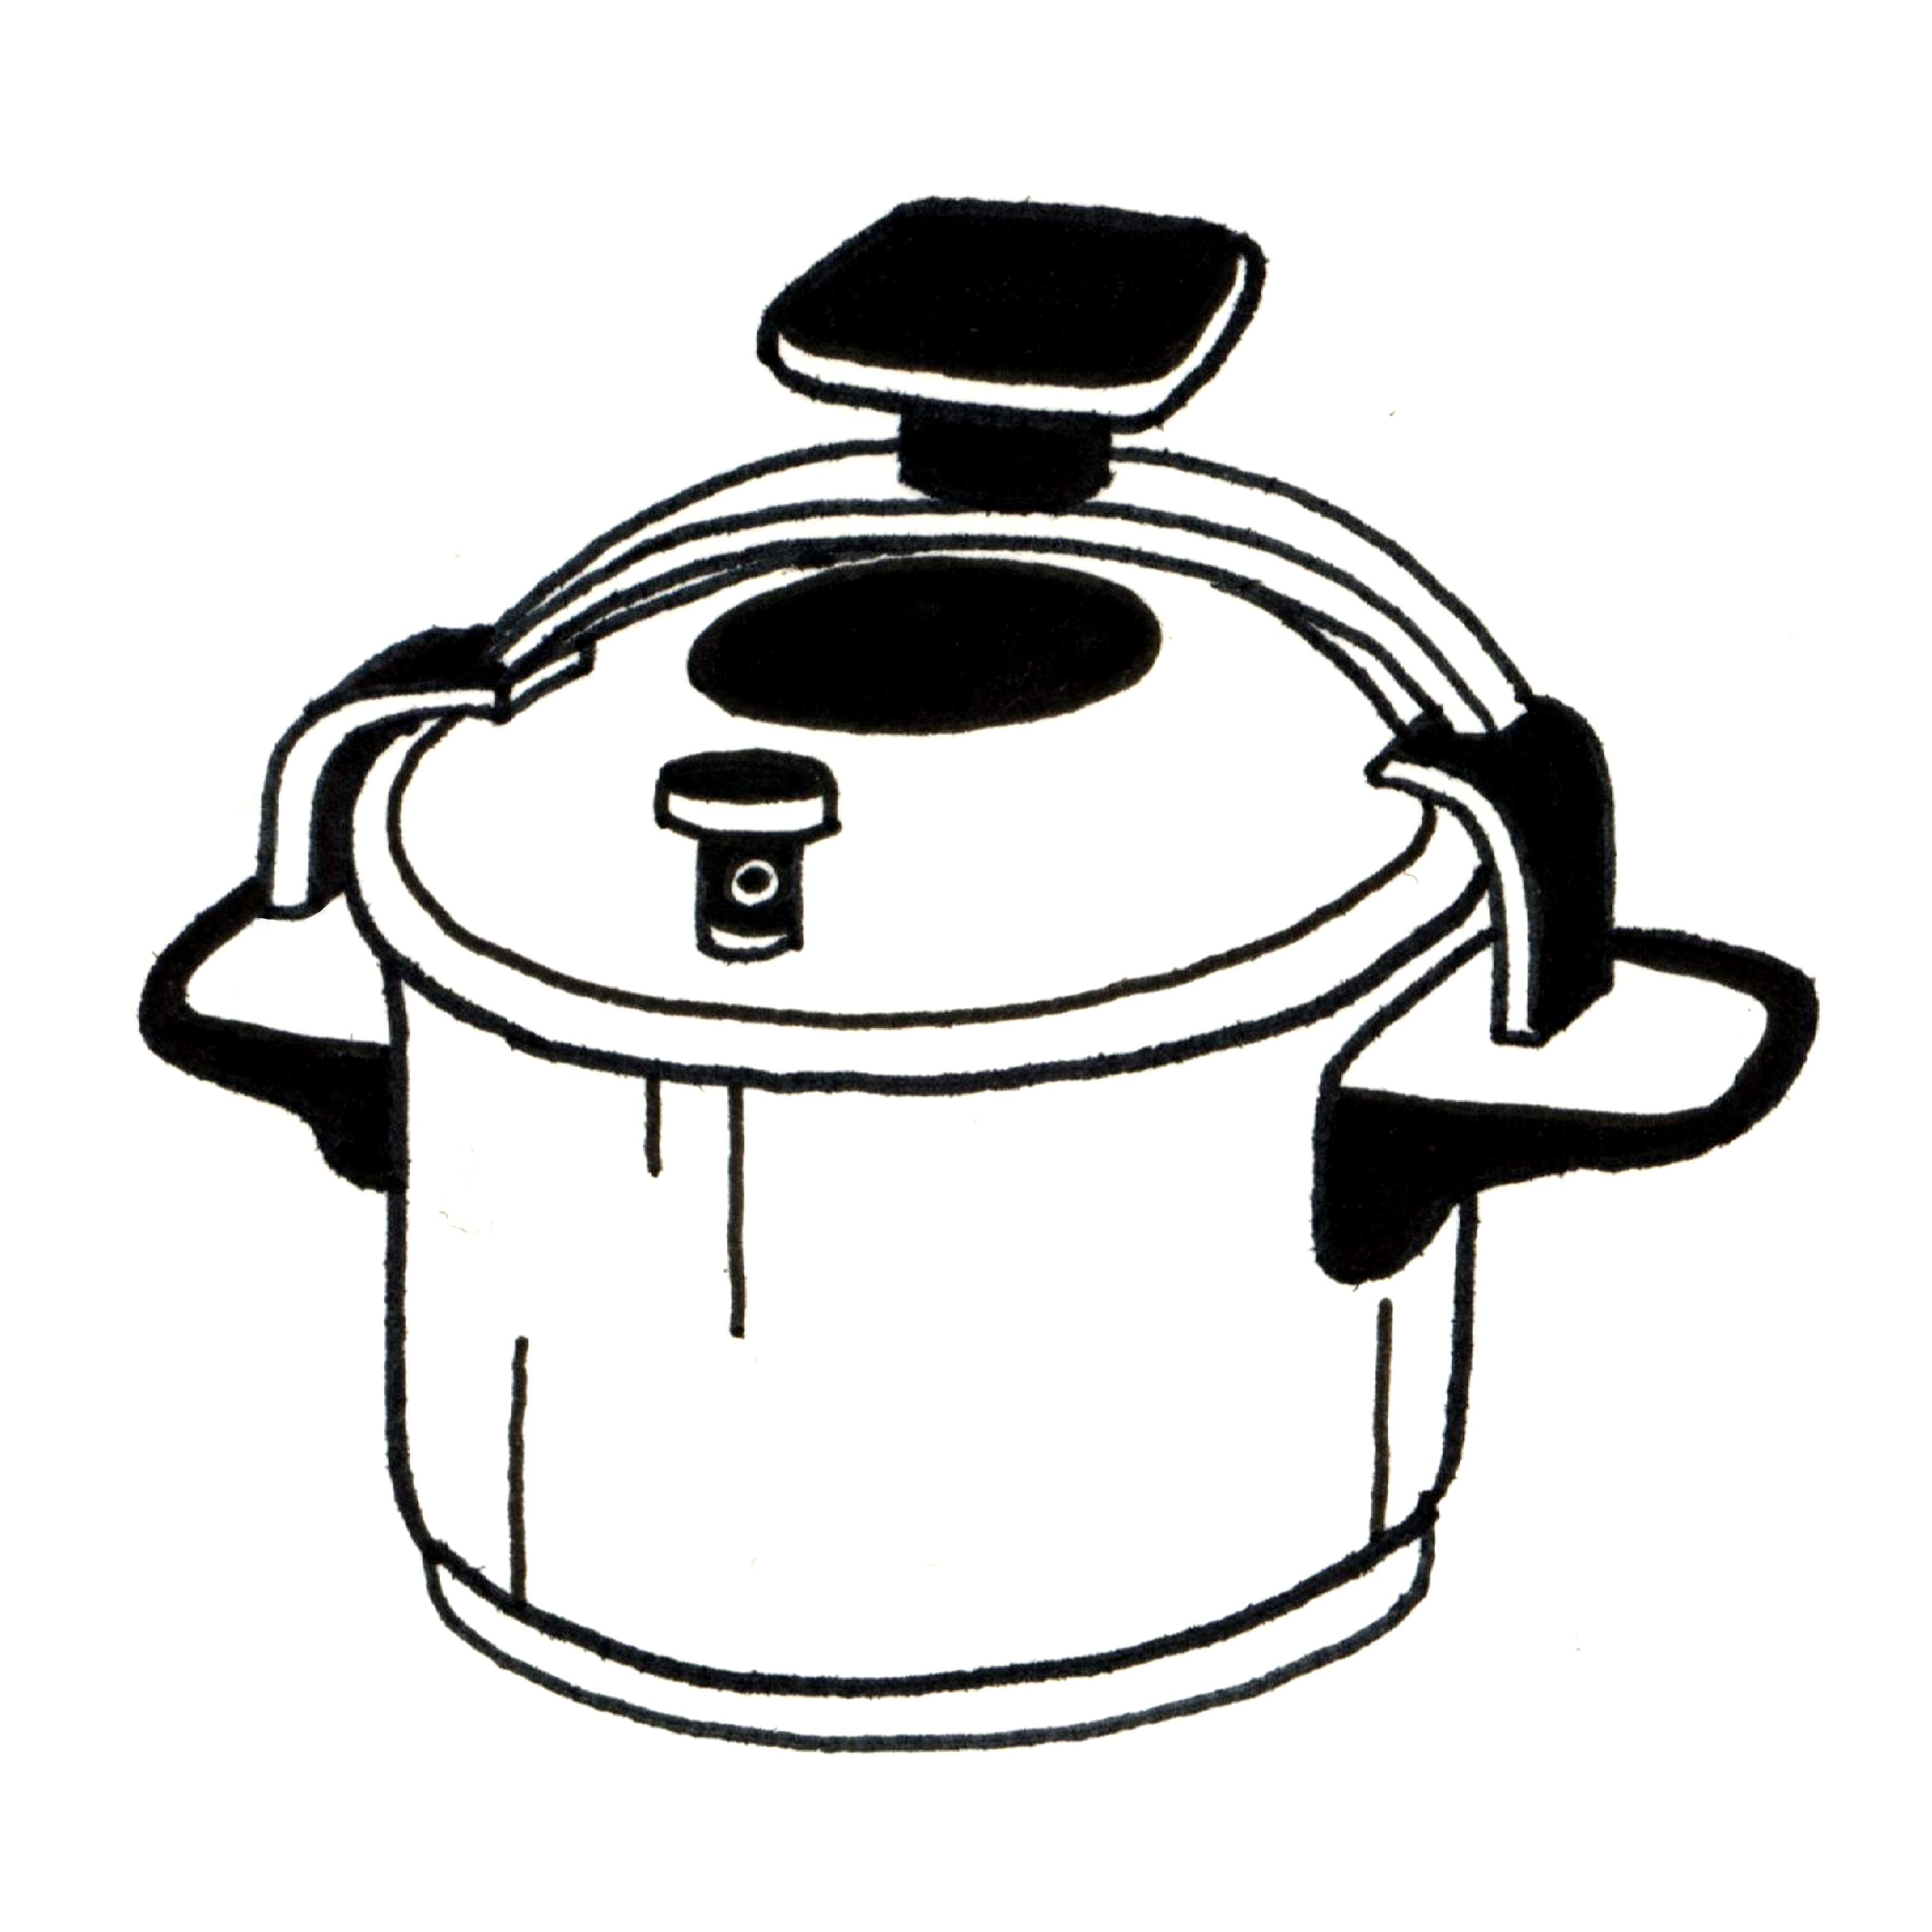 Dessin Marmite ressources Éducatives libres - data.abuledu | les ressources